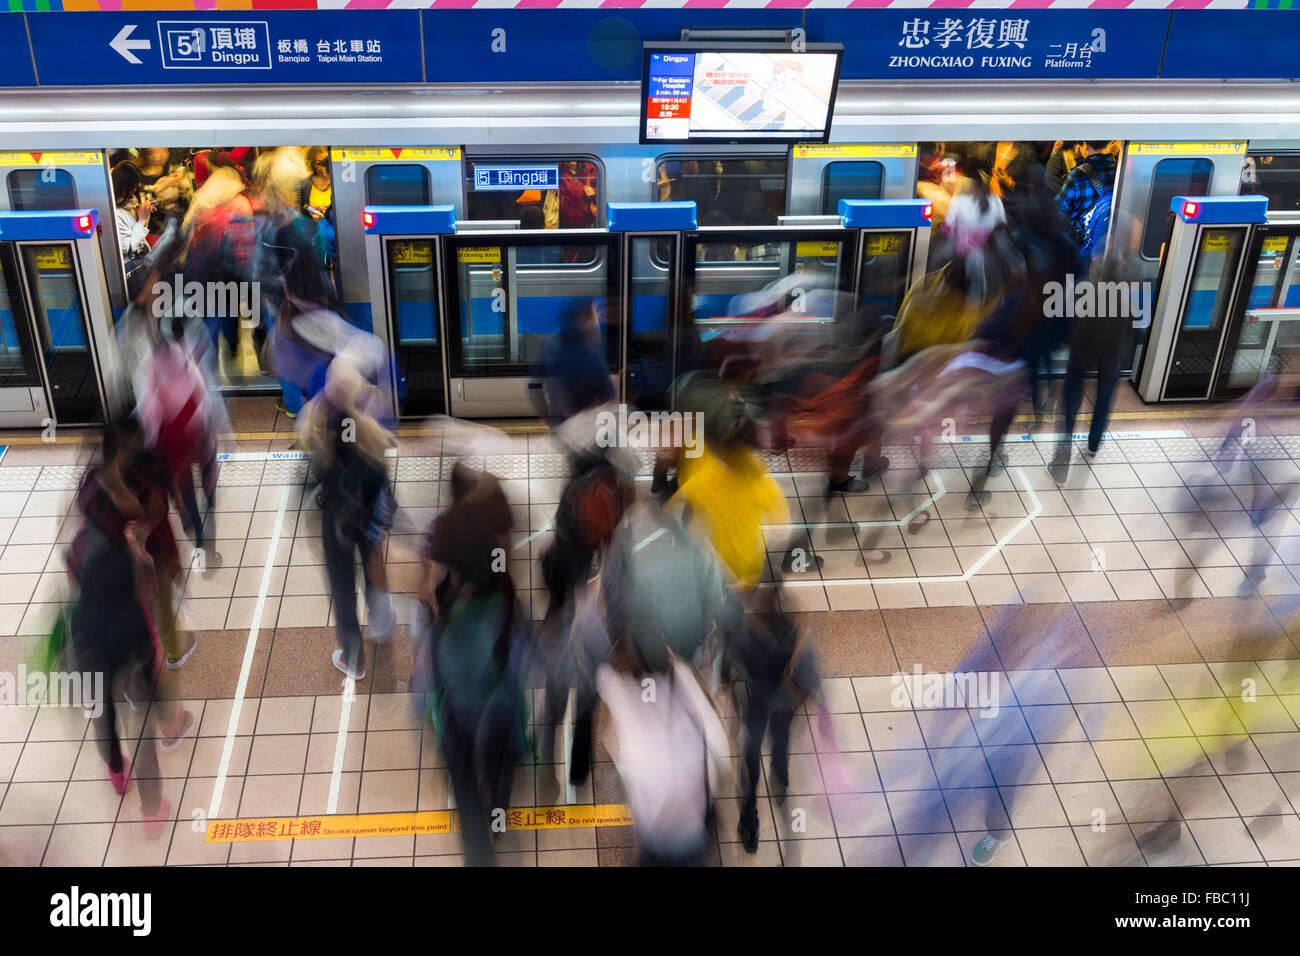 commuters-boarding-taipei-mrt-subway-at-